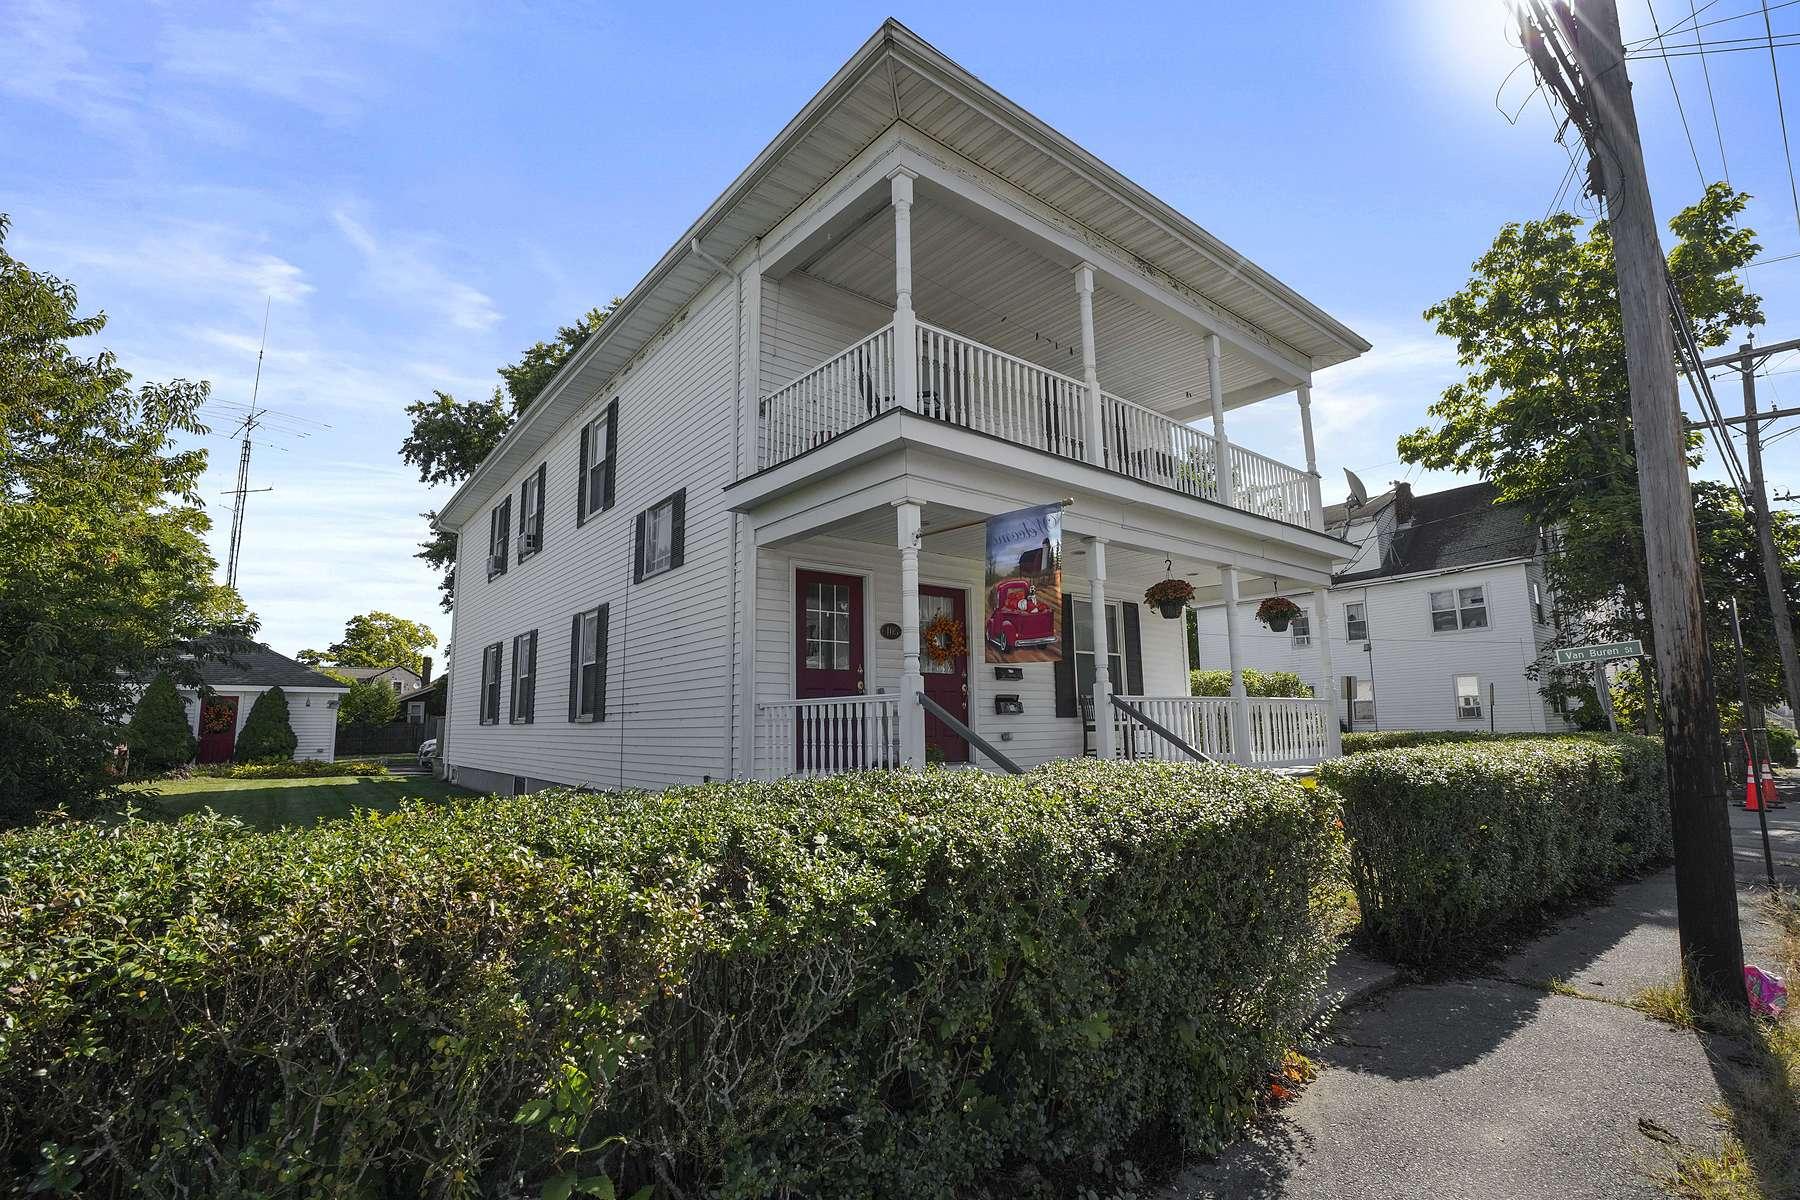 Multi-Family Homes 용 매매 에 405 Washington St, Taunton Taunton, 매사추세츠 02780 미국